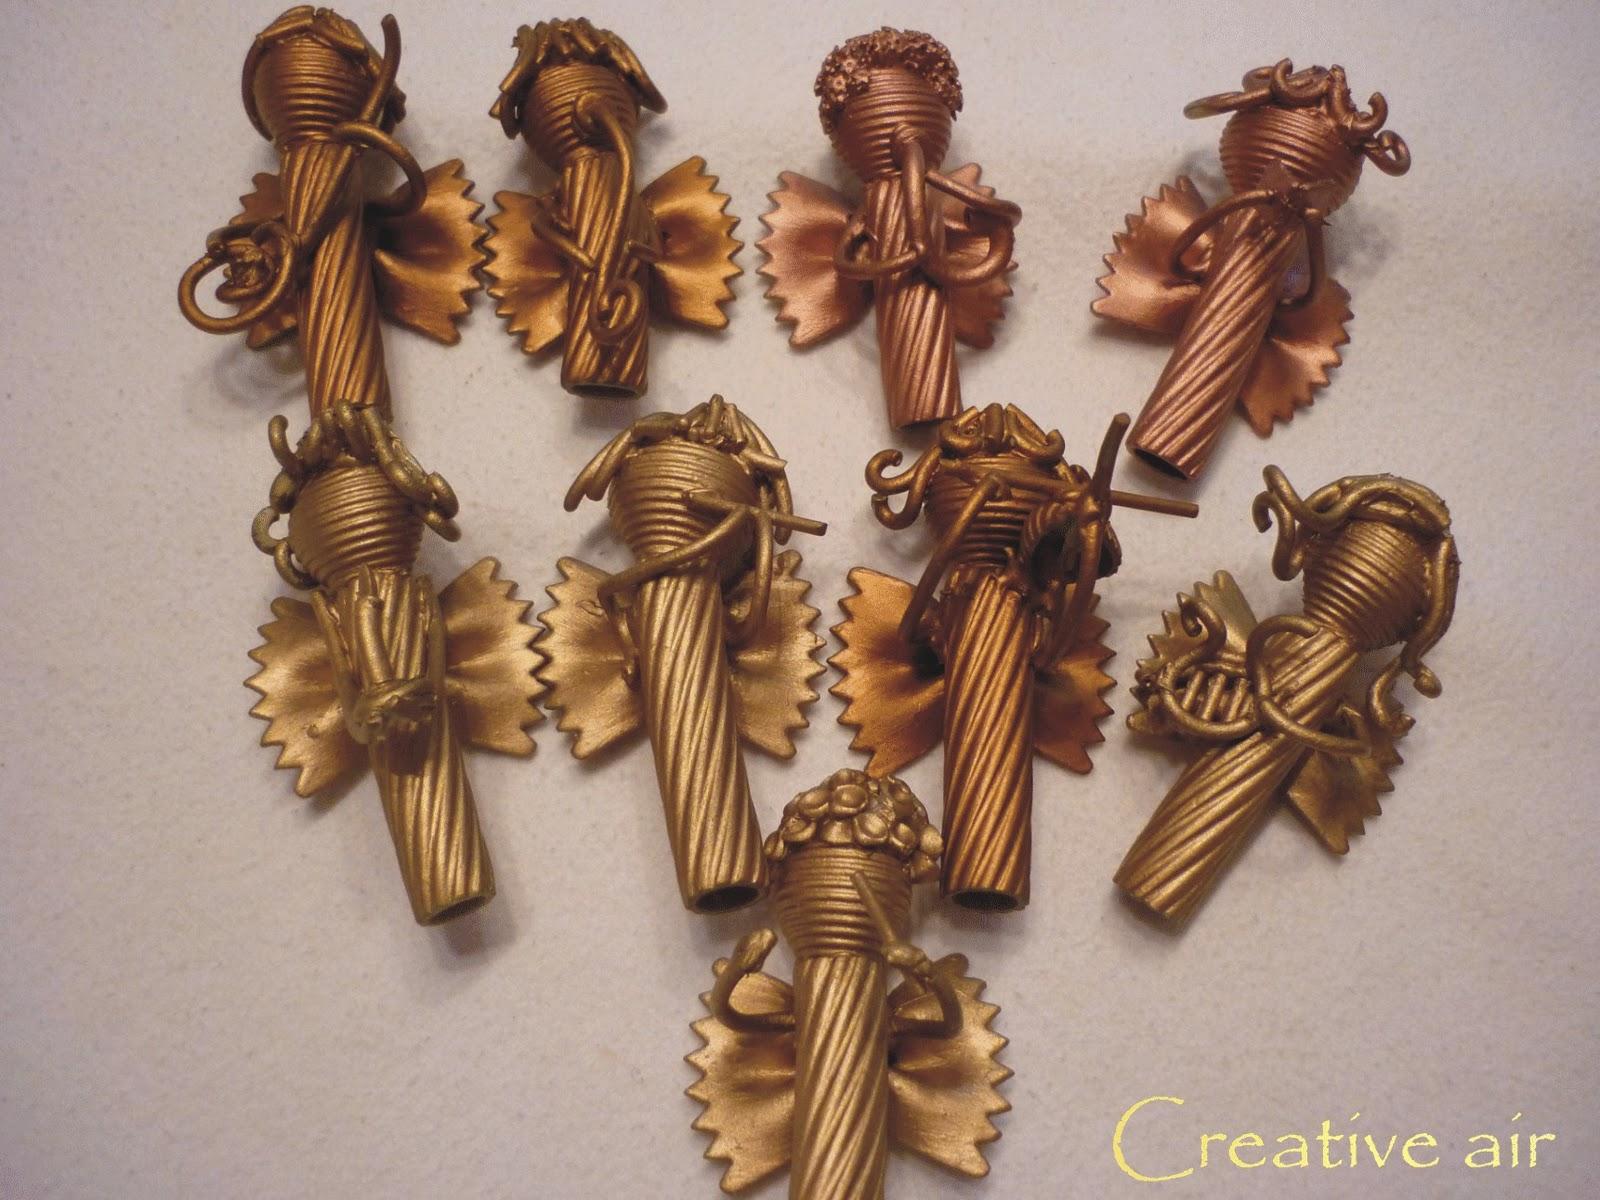 Creative air decorazioni natalizie 2 2 - Decorazioni natalizie ...